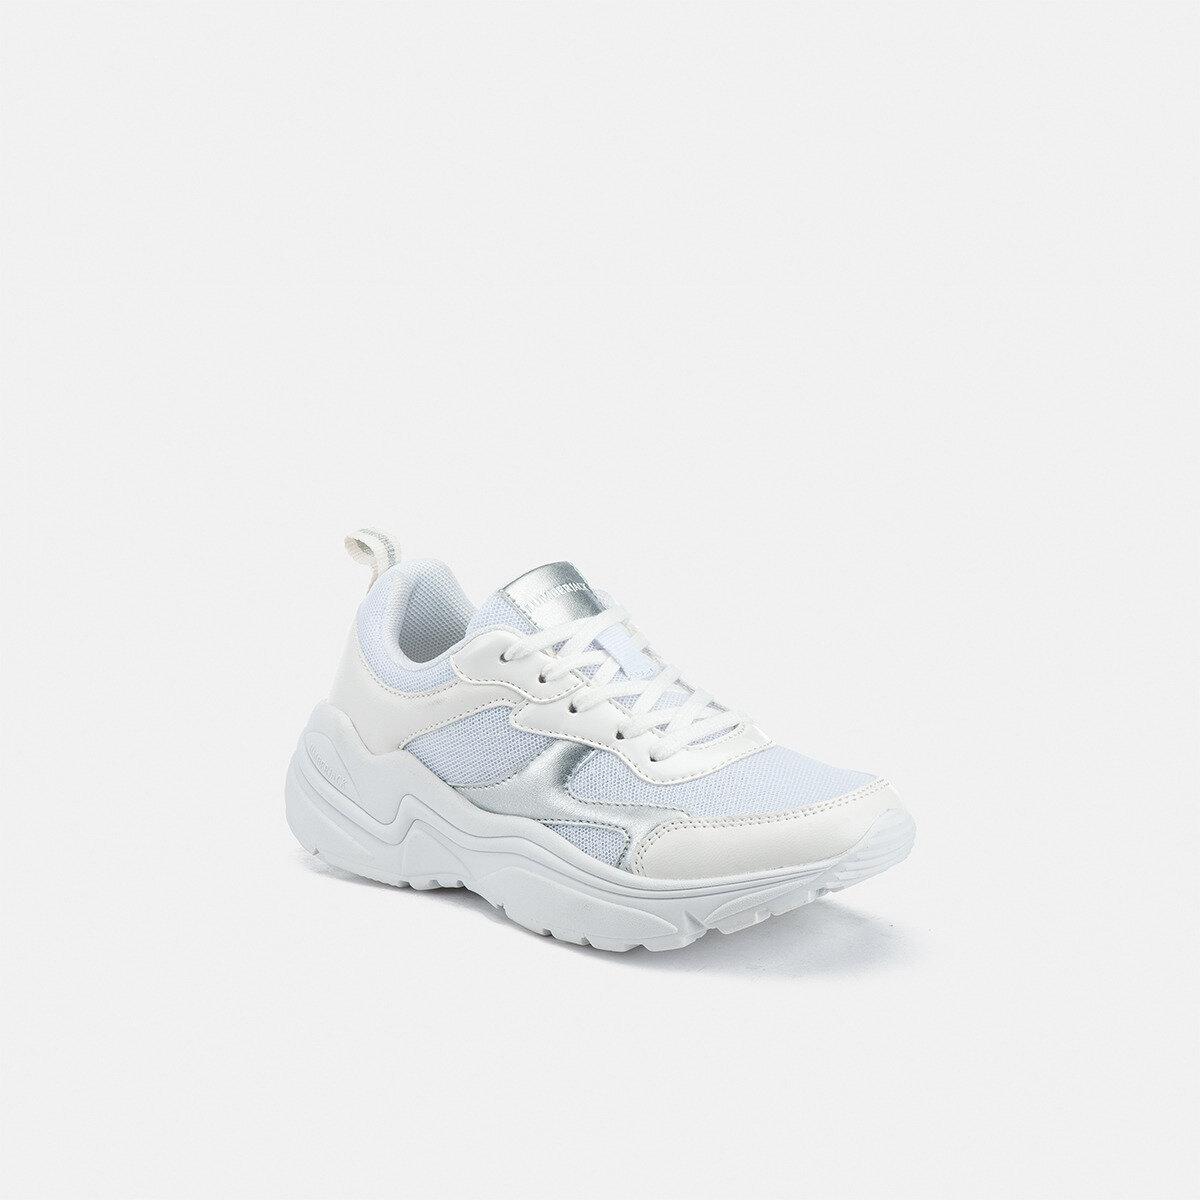 DREW WHITE/SILVER Girl Sneakers